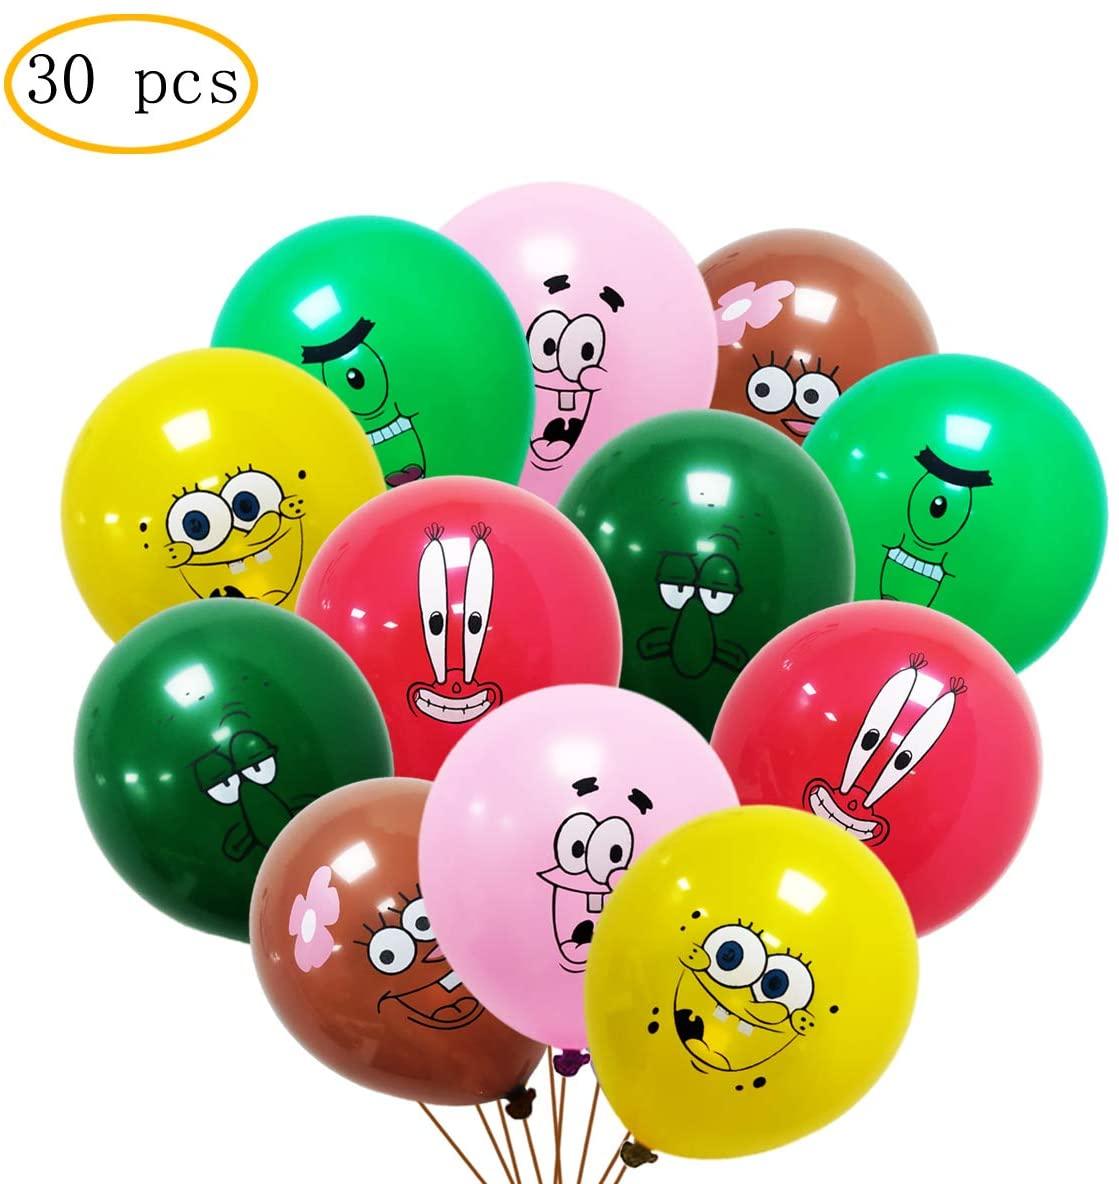 30 pcs Spongebob Balloons,Kids Baby Shower Birthday Party Supplies,Large 12